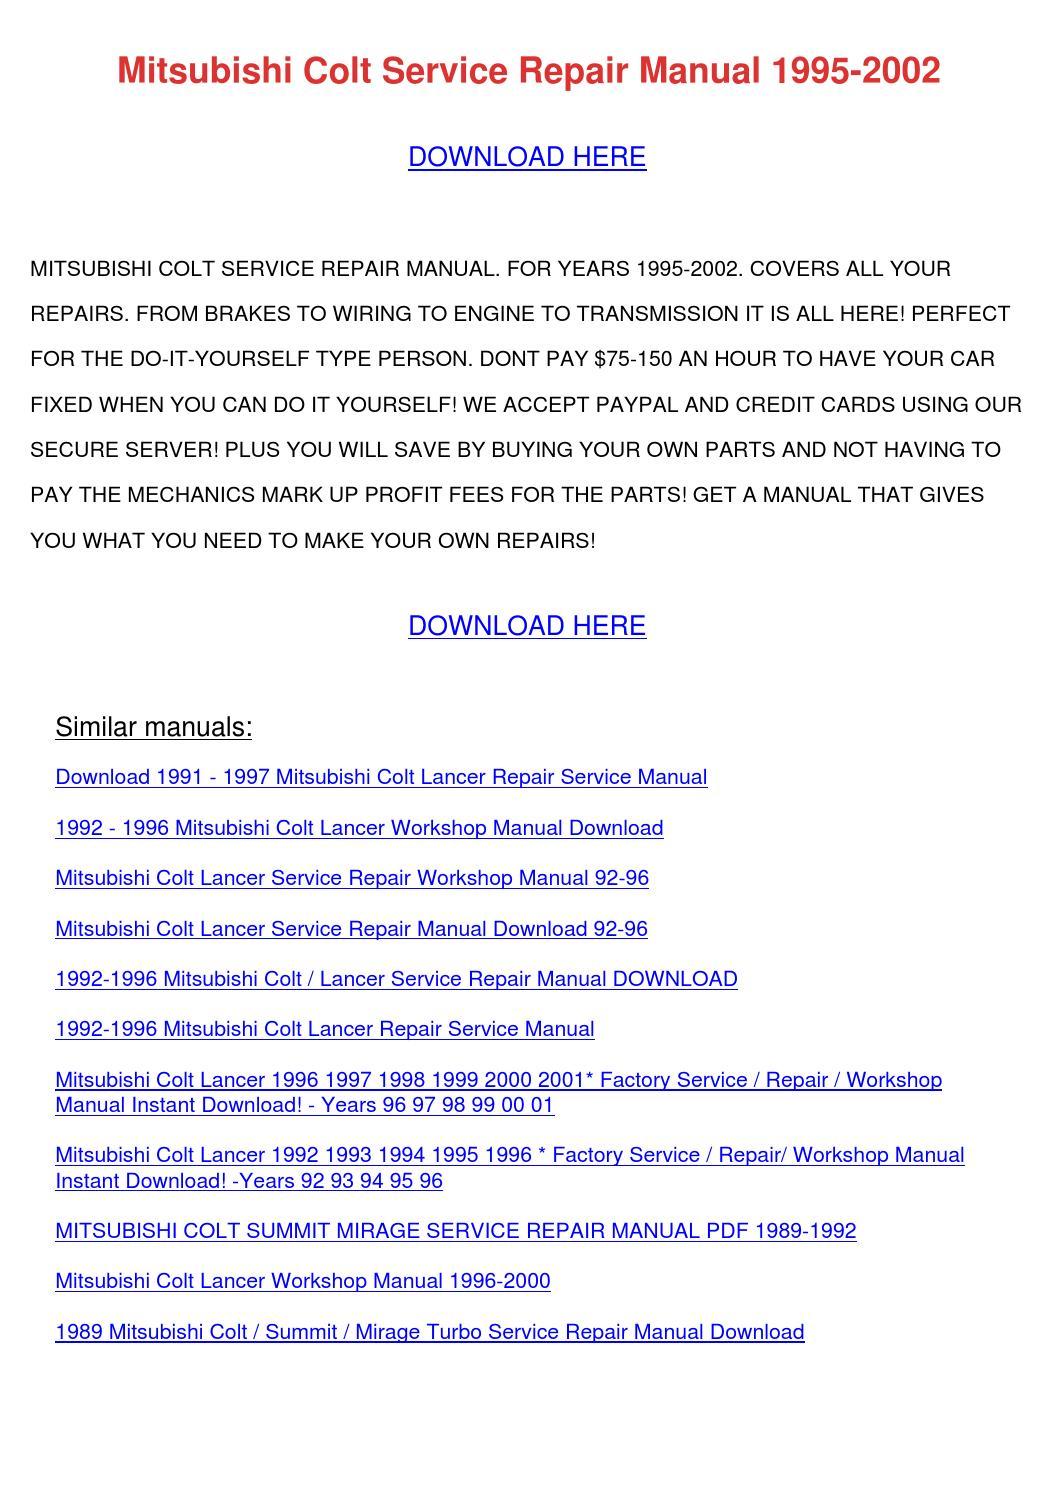 mitsubishi colt service manual download